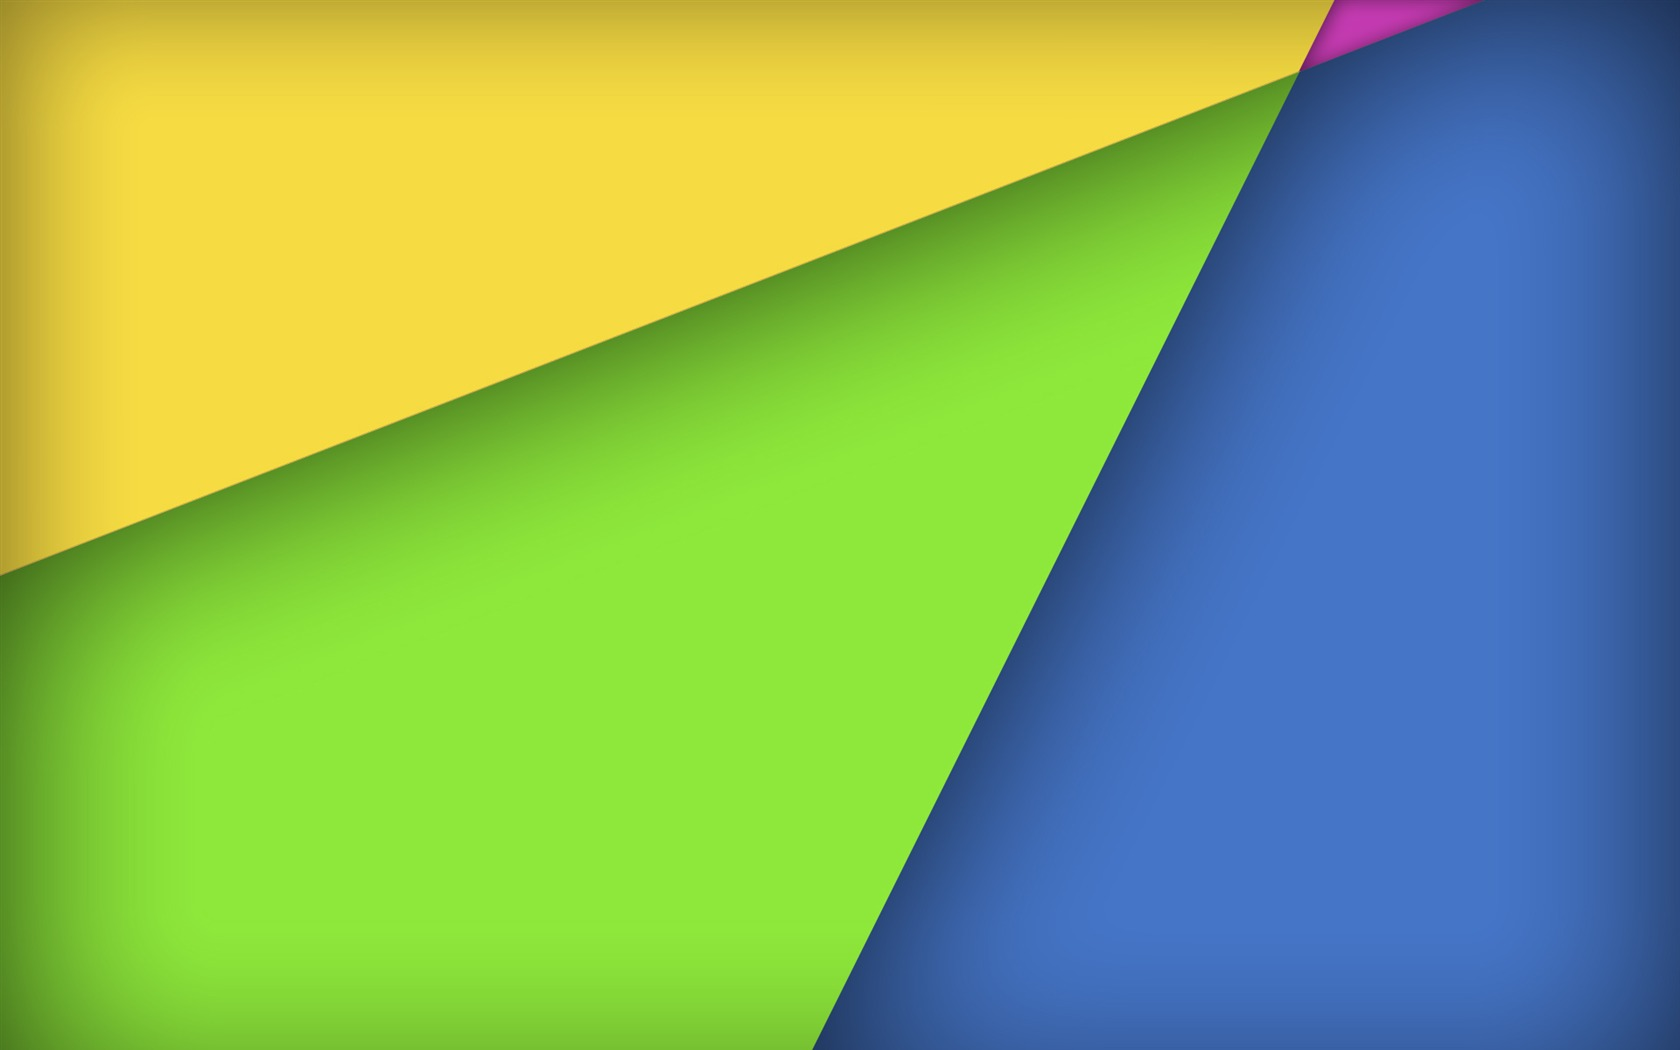 Google Nexus 7 Tablet PC HD Desktop Wallpaper 02   1680x1050 wallpaper 1680x1050